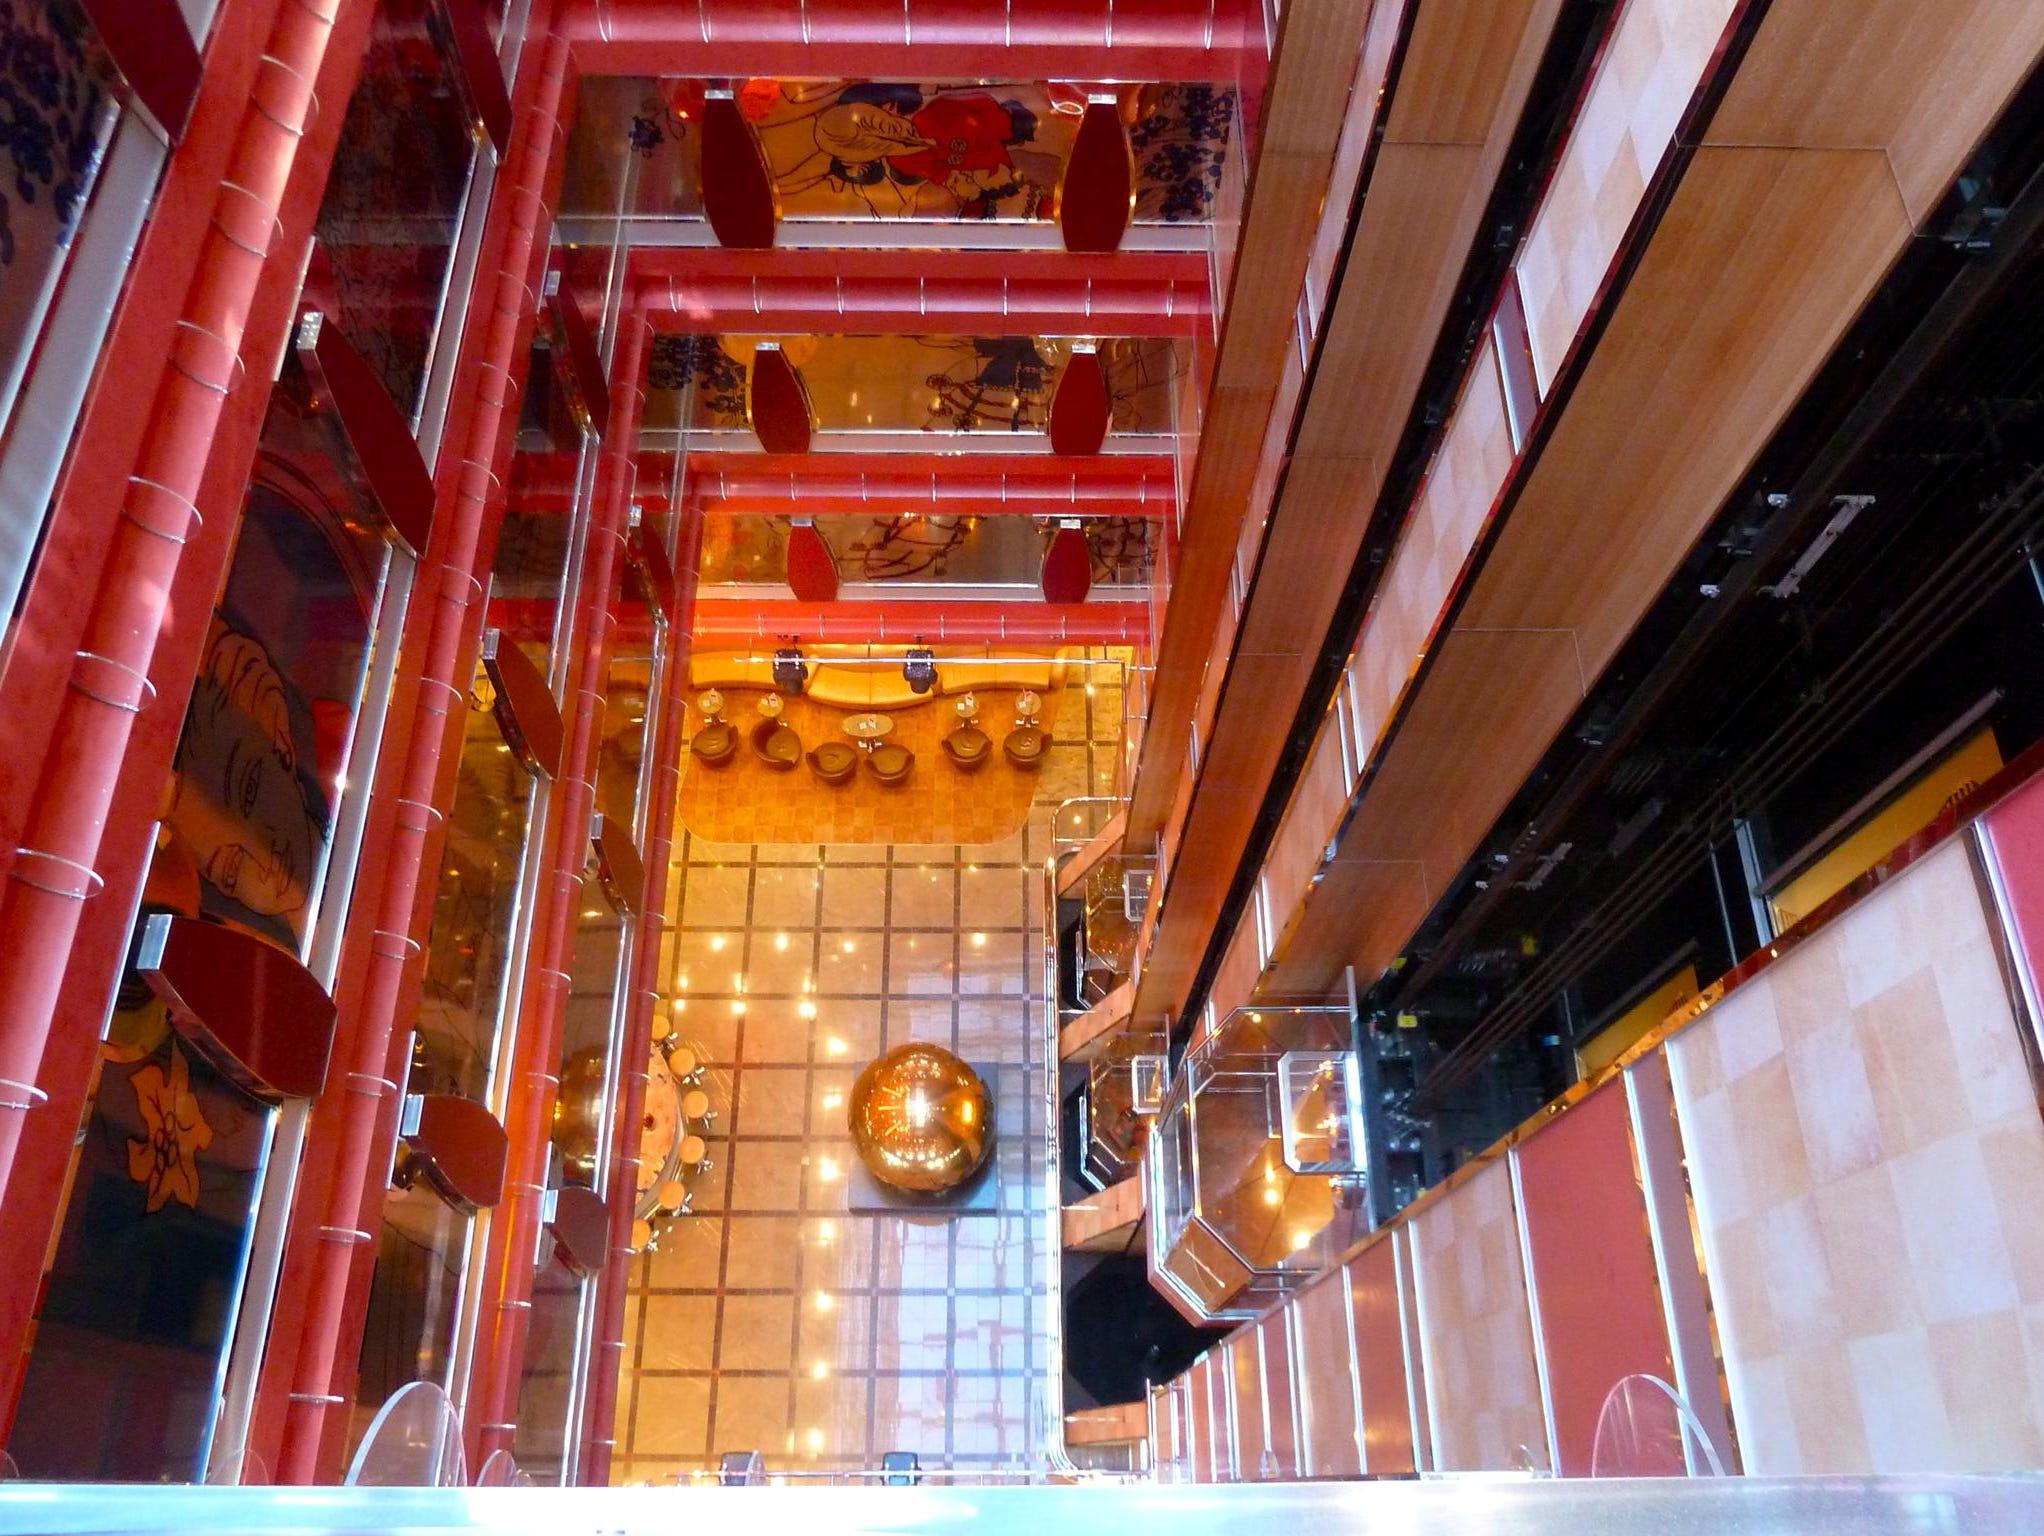 Club Deliziosa overlooks the soaring Atrio delle Delizie, an eight-deck-tall, glass skylight-topped atrium.